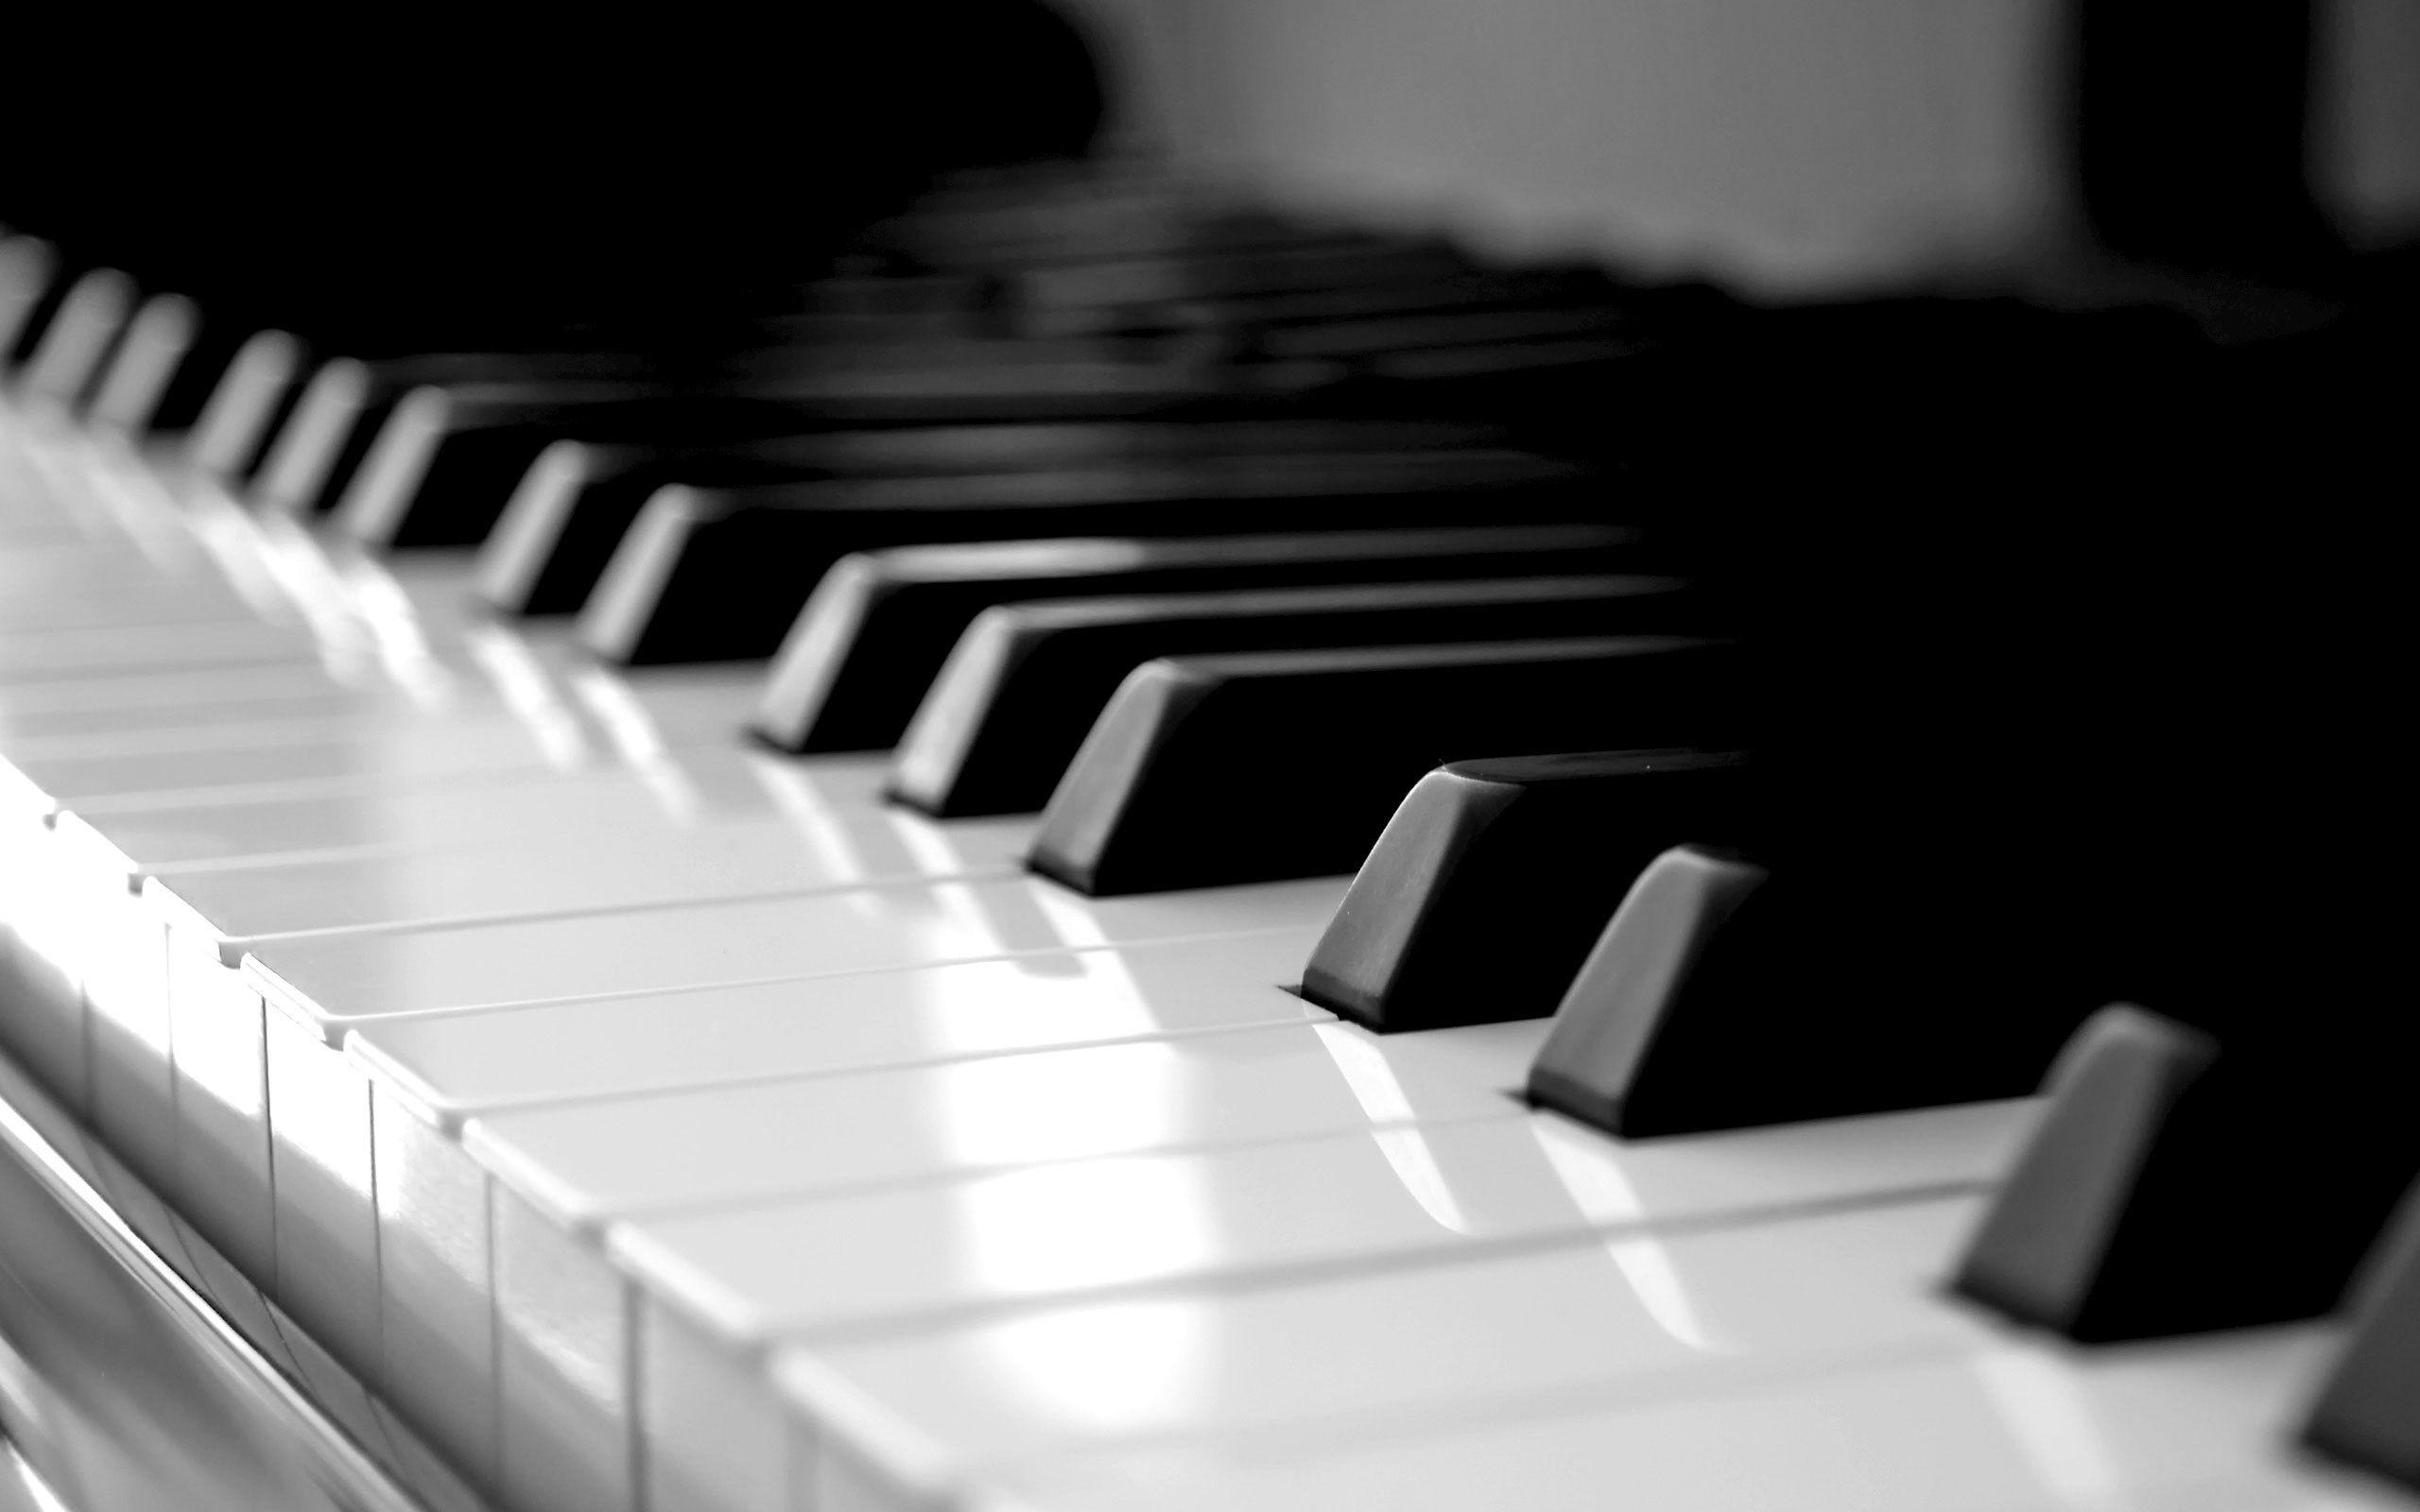 Download Hd Piano Backgrounds 1 Piano Music Keyboard Learn Piano